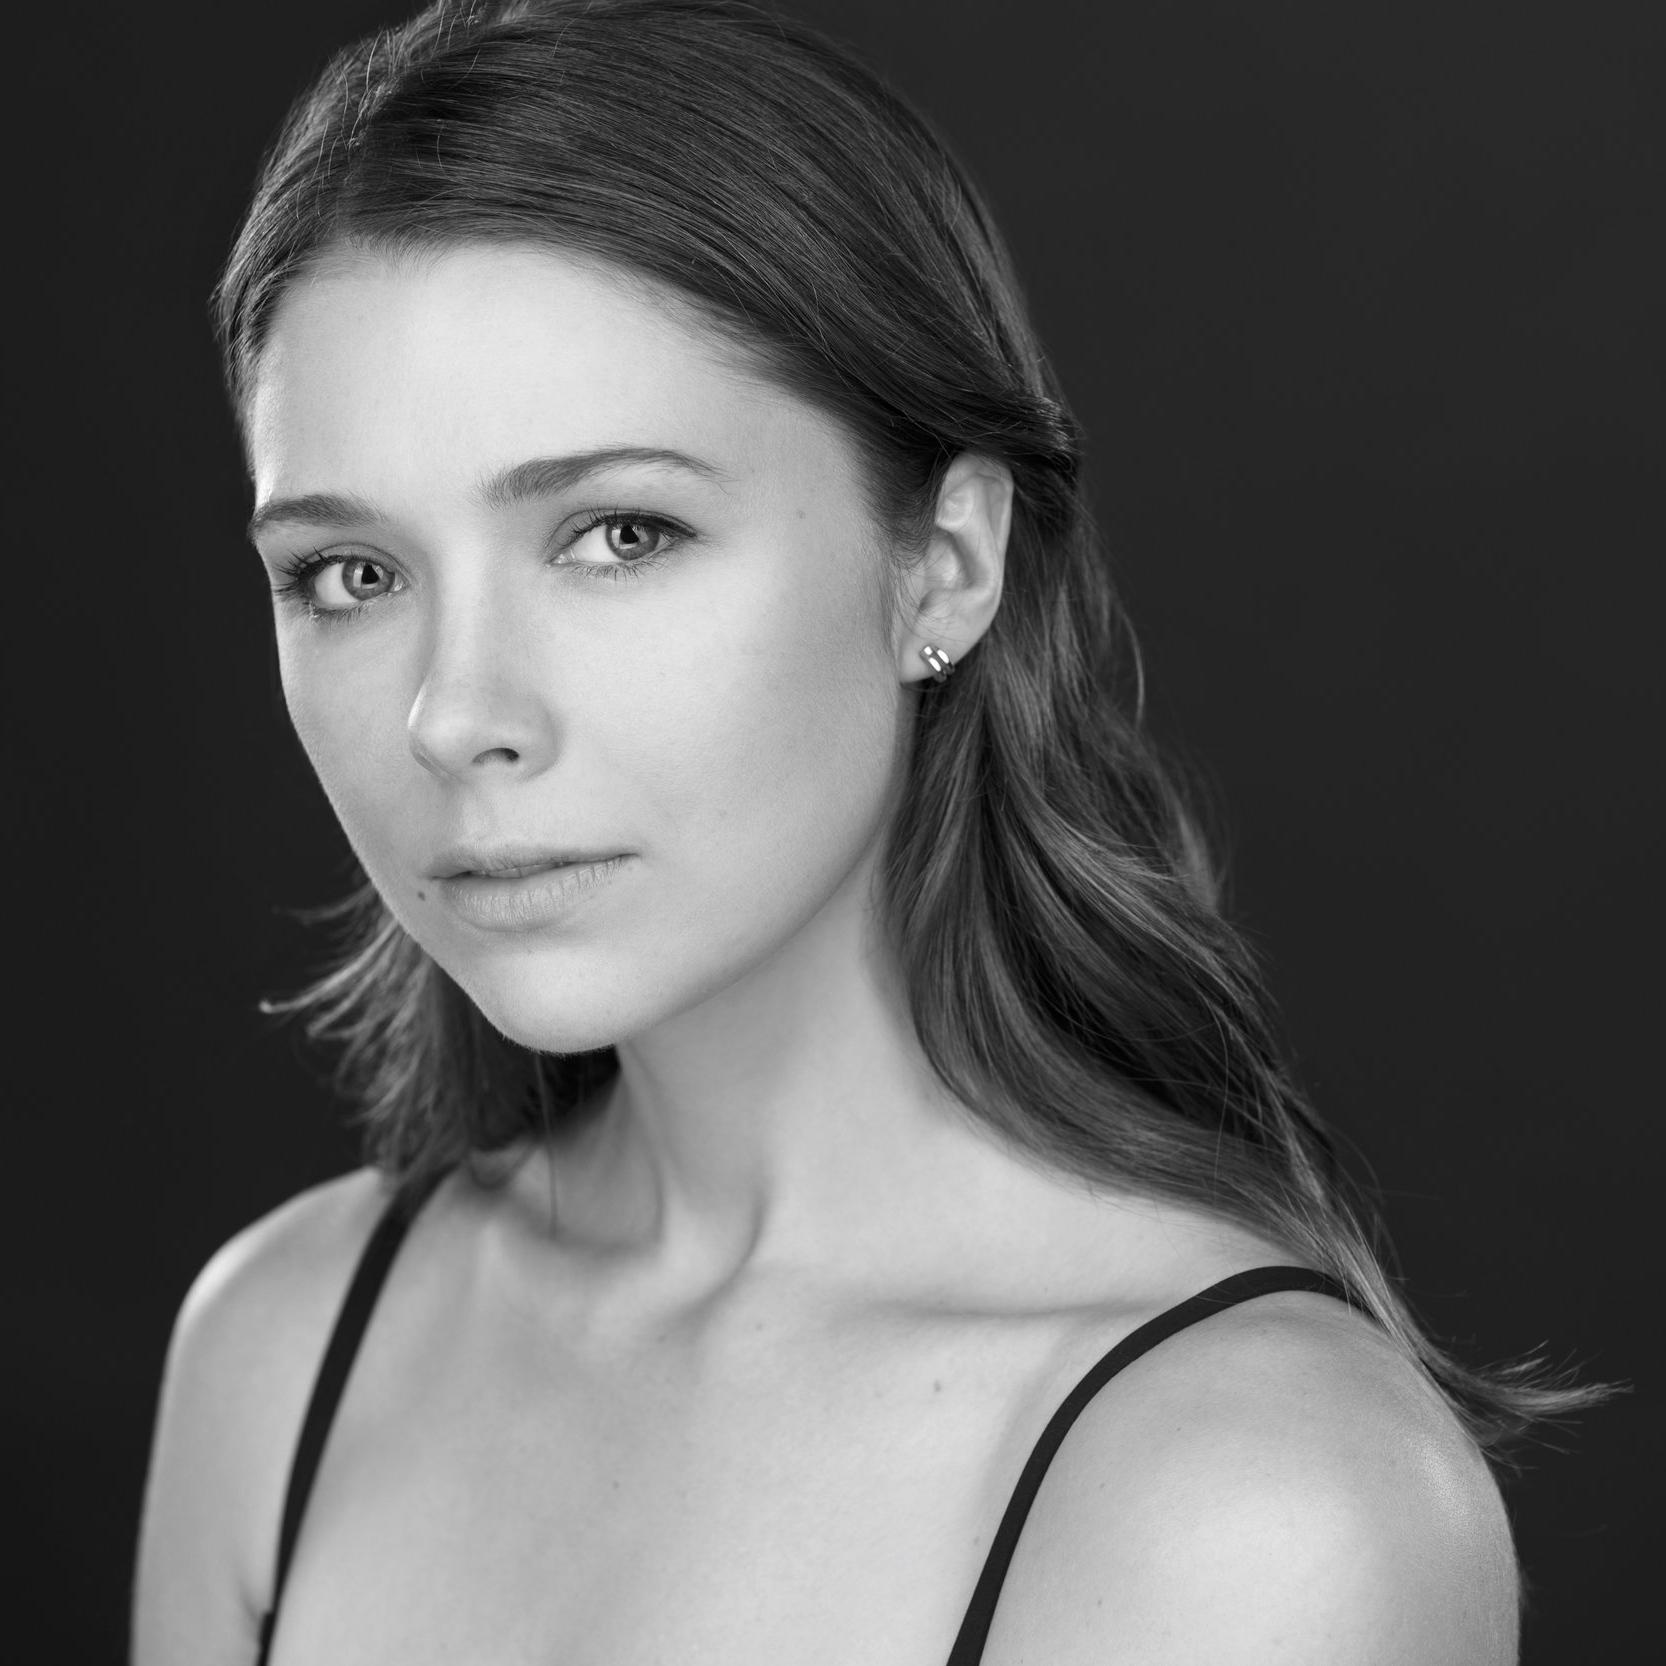 Rebeca Robles / Producer, Actor (Karla)